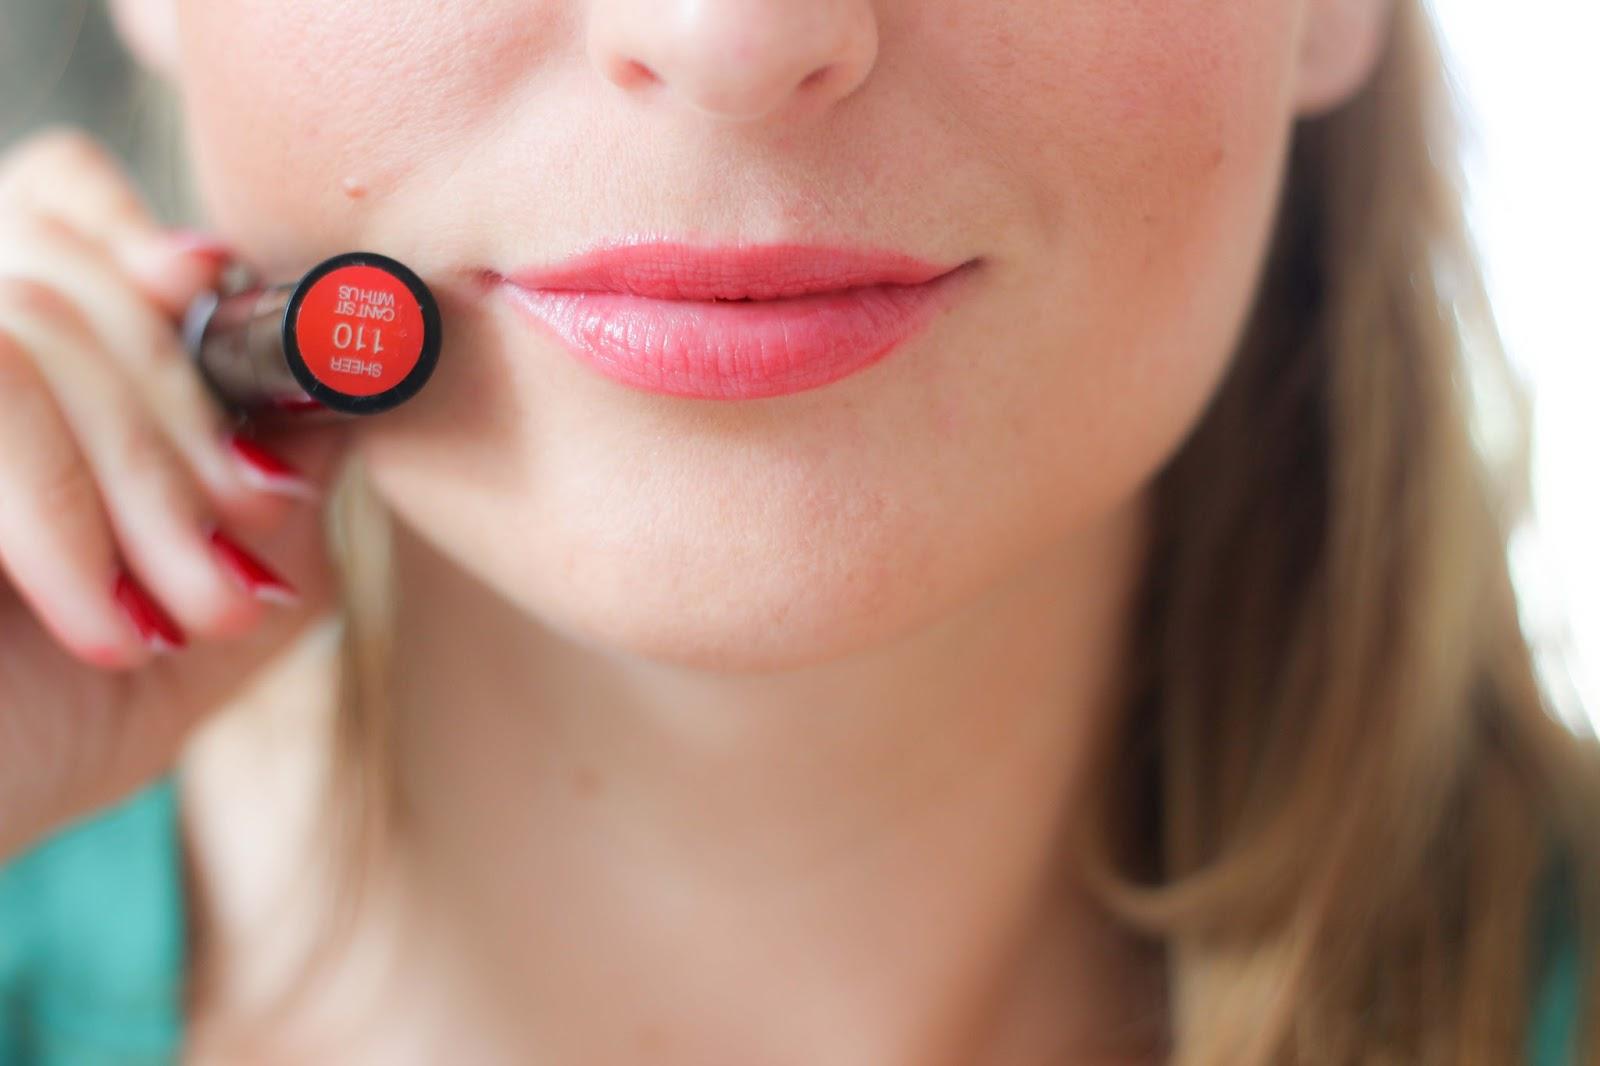 Red Lips- Roter kräftiger Lippenstift-Sexy Balm - Lippenstifttest - Lippenstift Bericht - beauty Blog - Fashionstylebyjohanna - Blogger aus Frankfurt - Frankfurt Fashionblogger